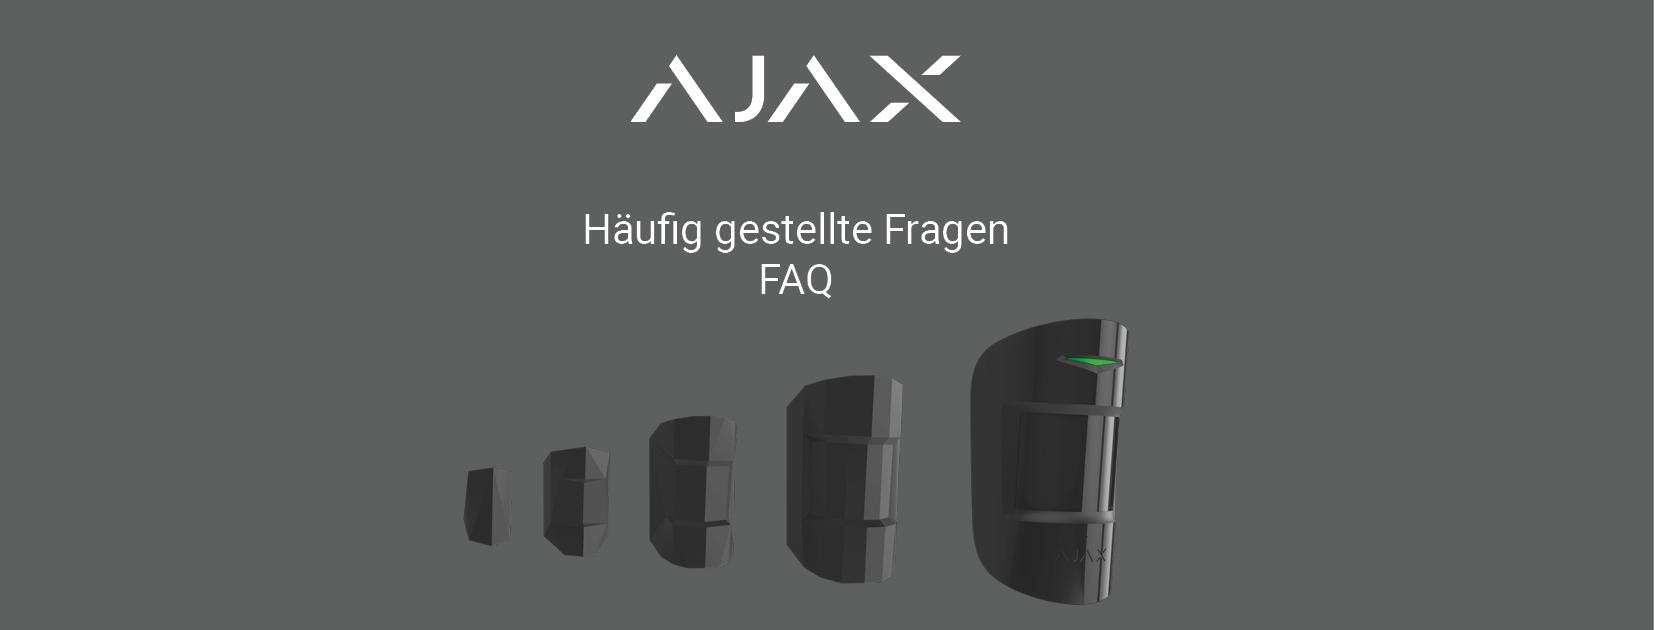 Ajax_alarmanlage-faq